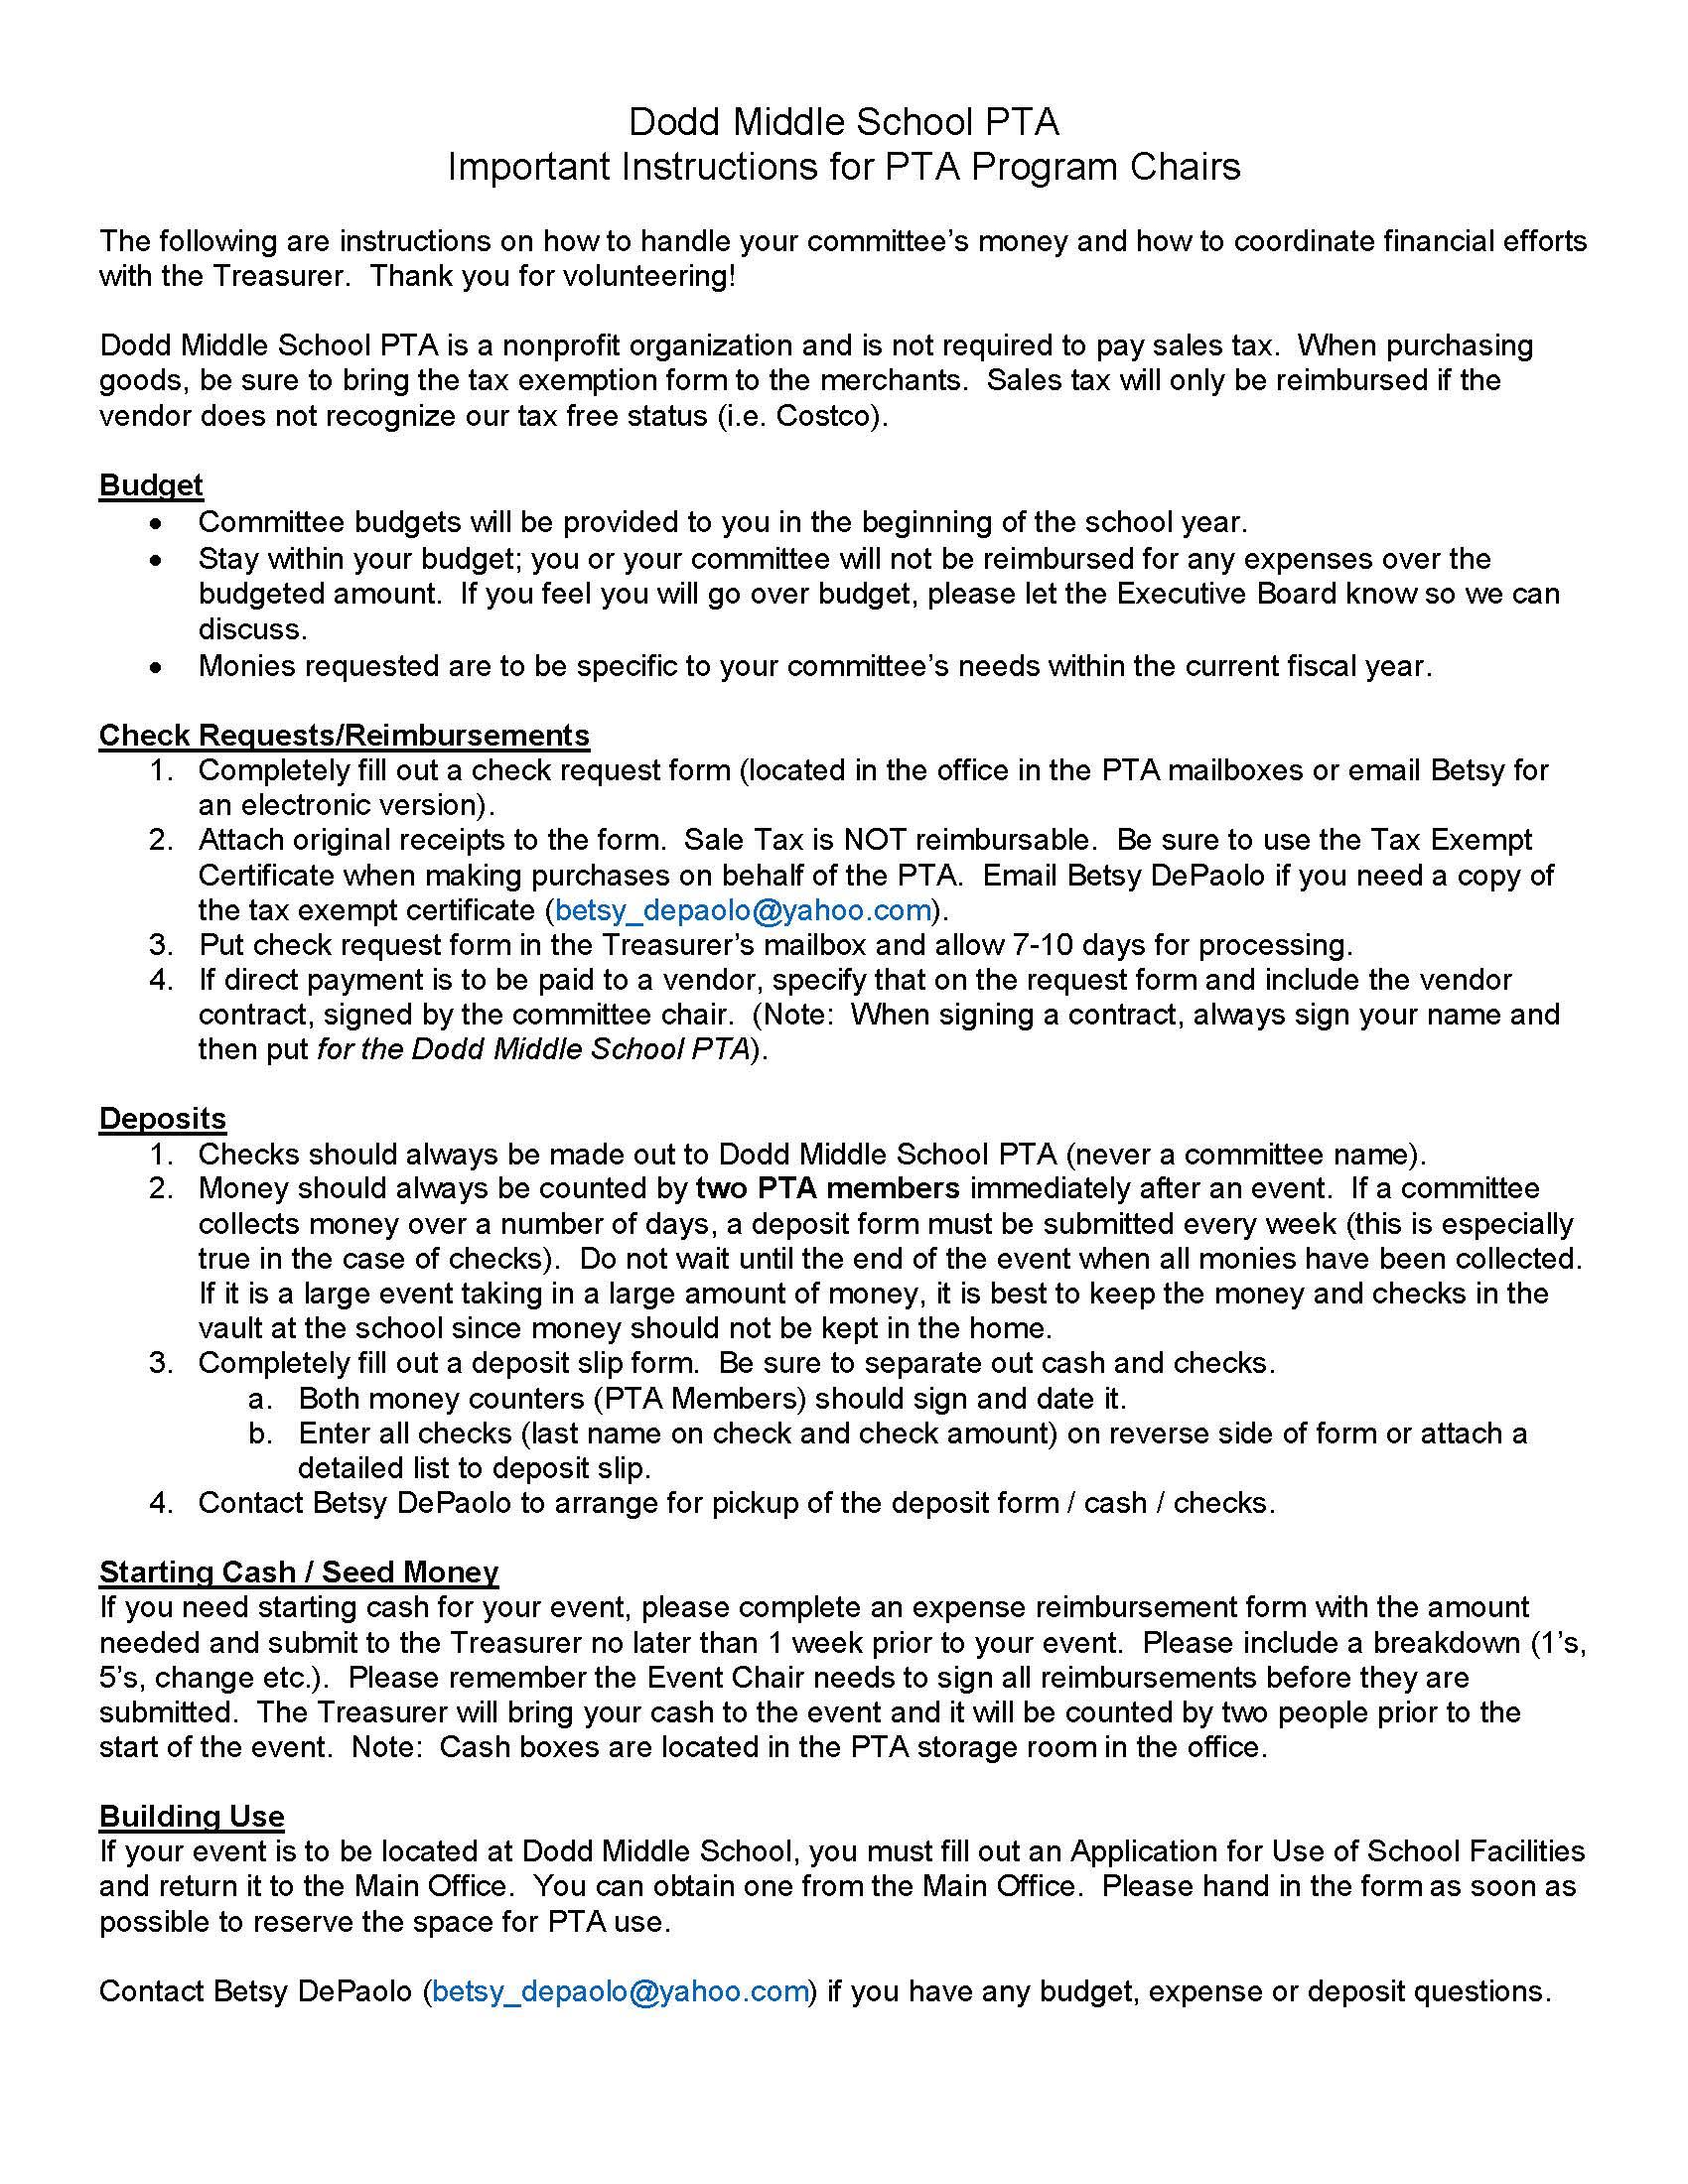 dodd-middle-school-pta-financial-instructions.jpg